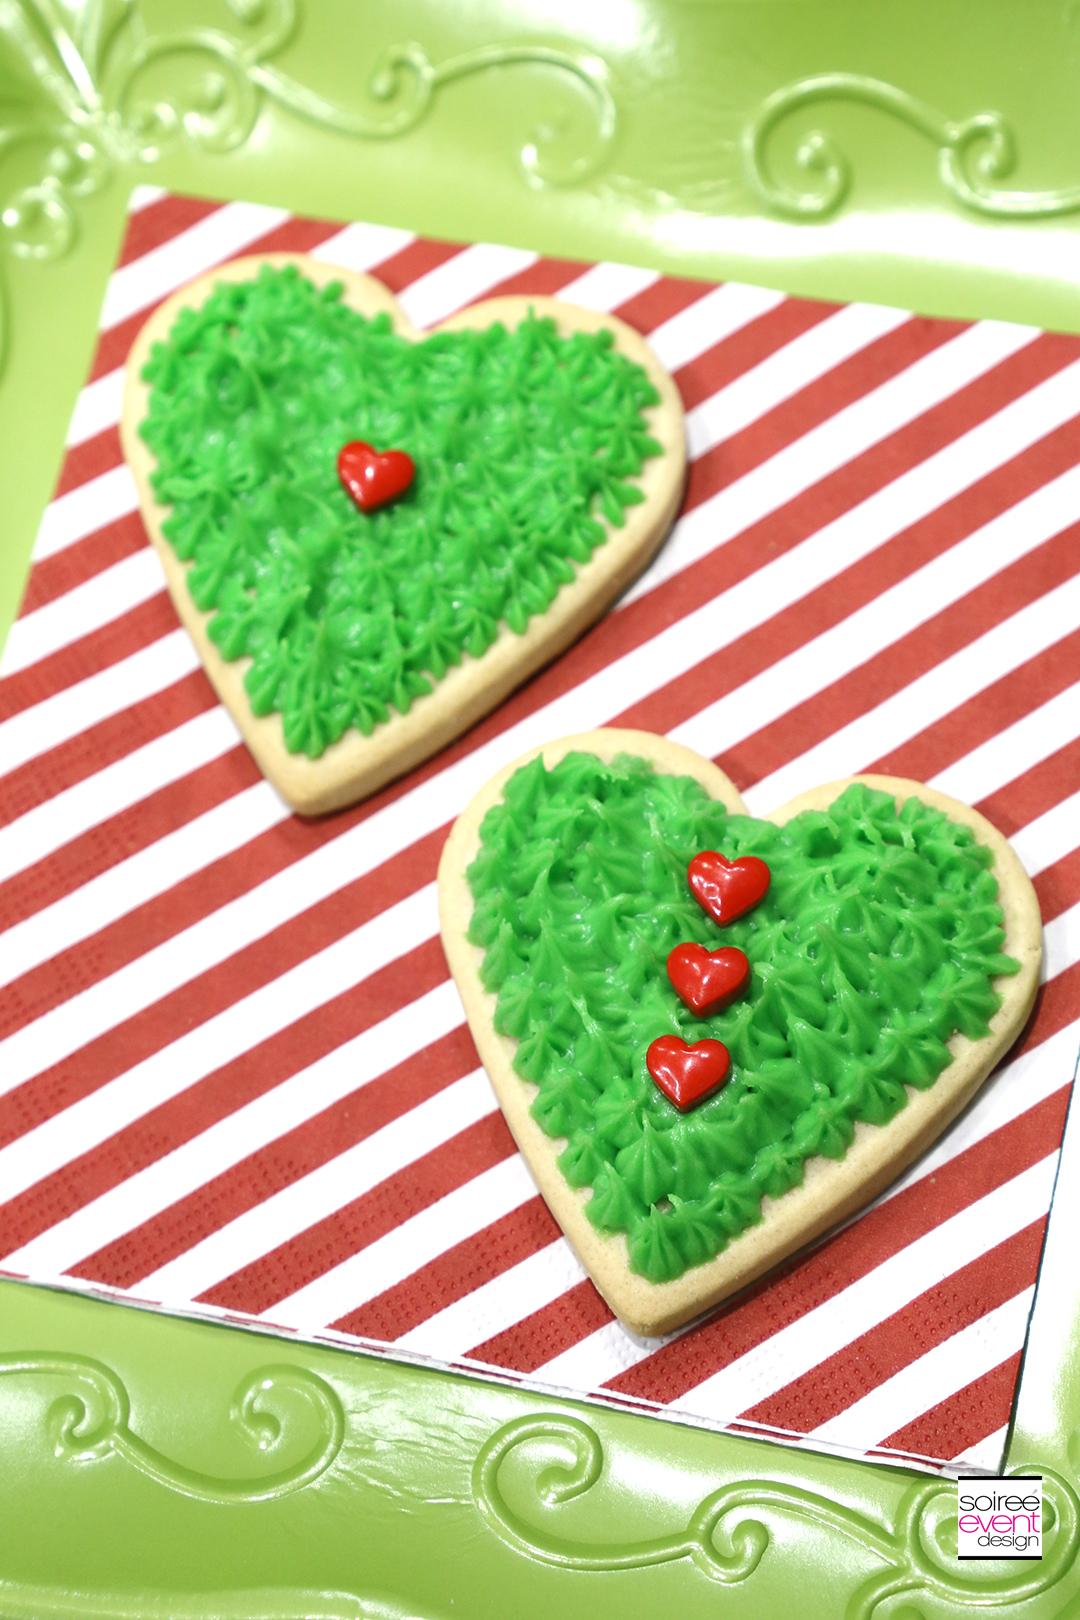 Grinch Dessert Ideas - Grinch Heart Cookies - Step 4